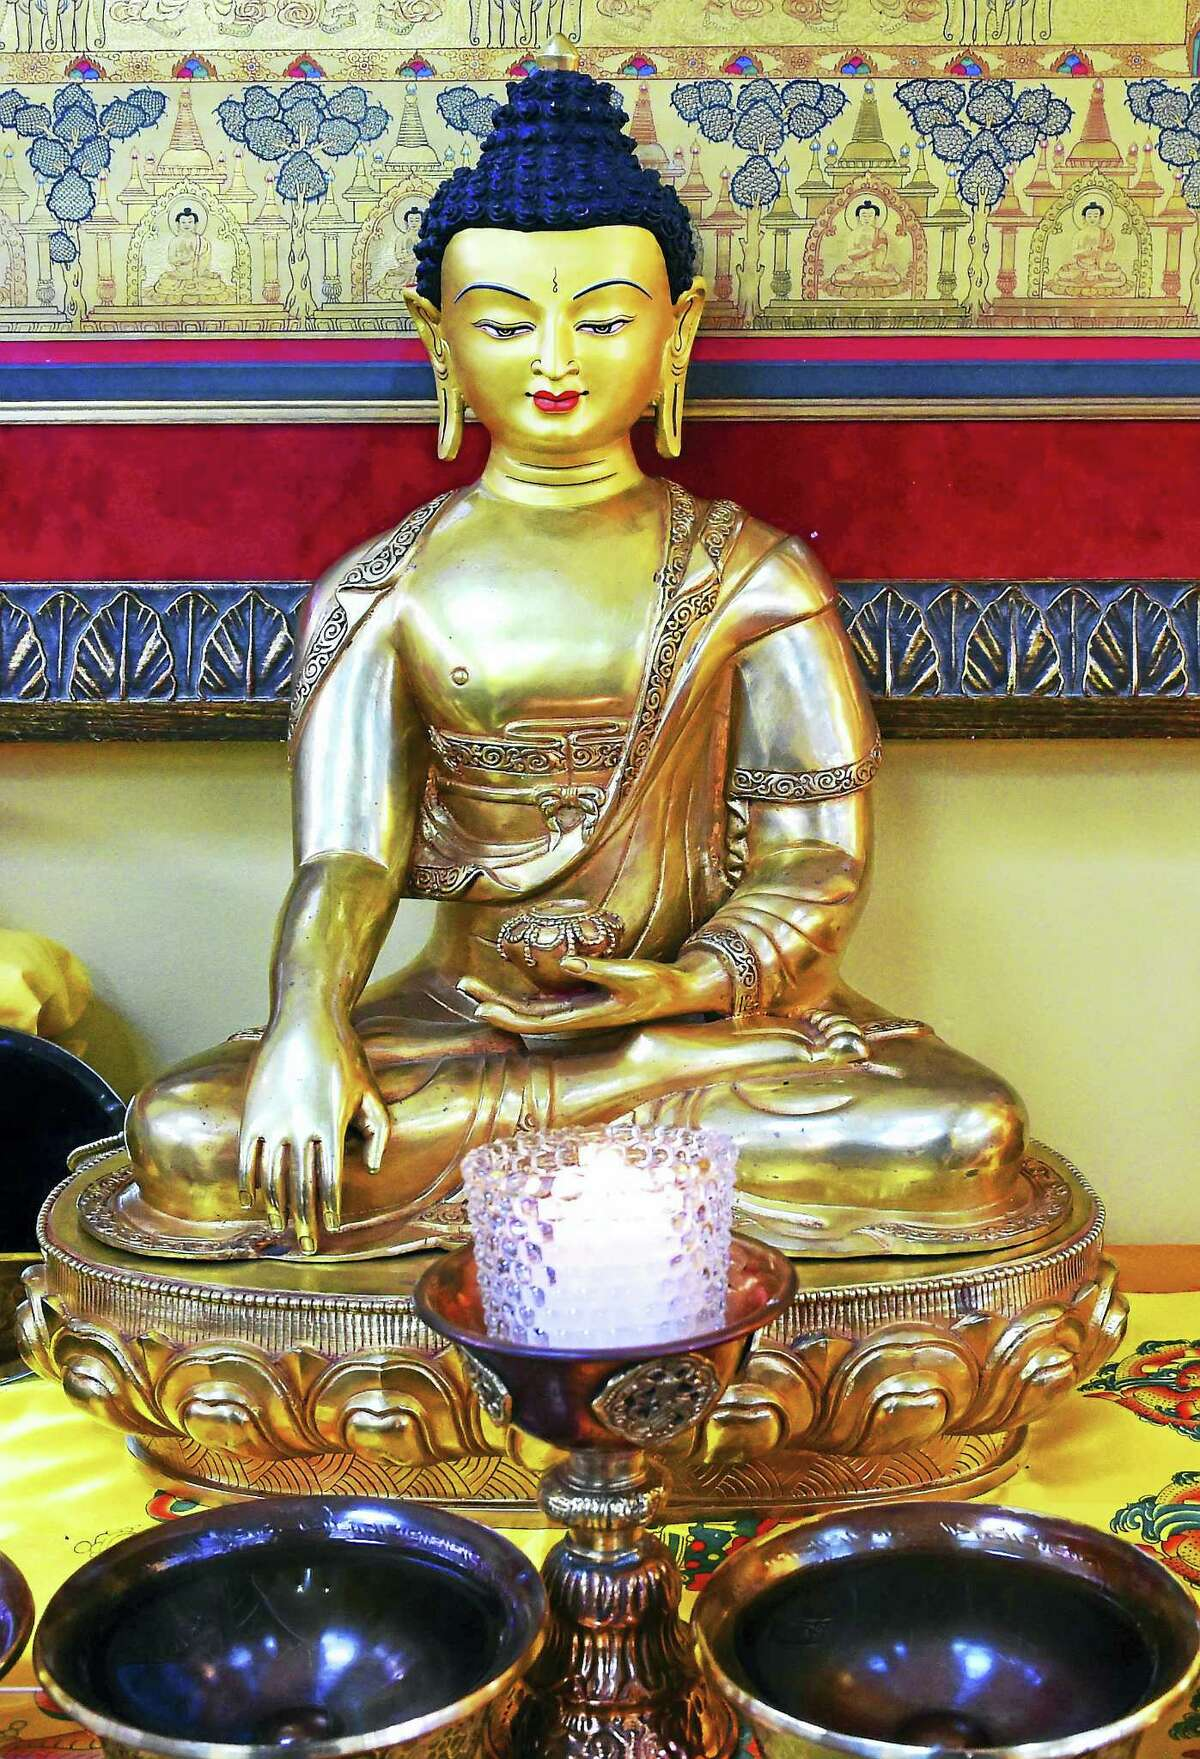 A sculpture of the Buddha Shakyamuni at the Buddhist Meditation Center of Guilford.